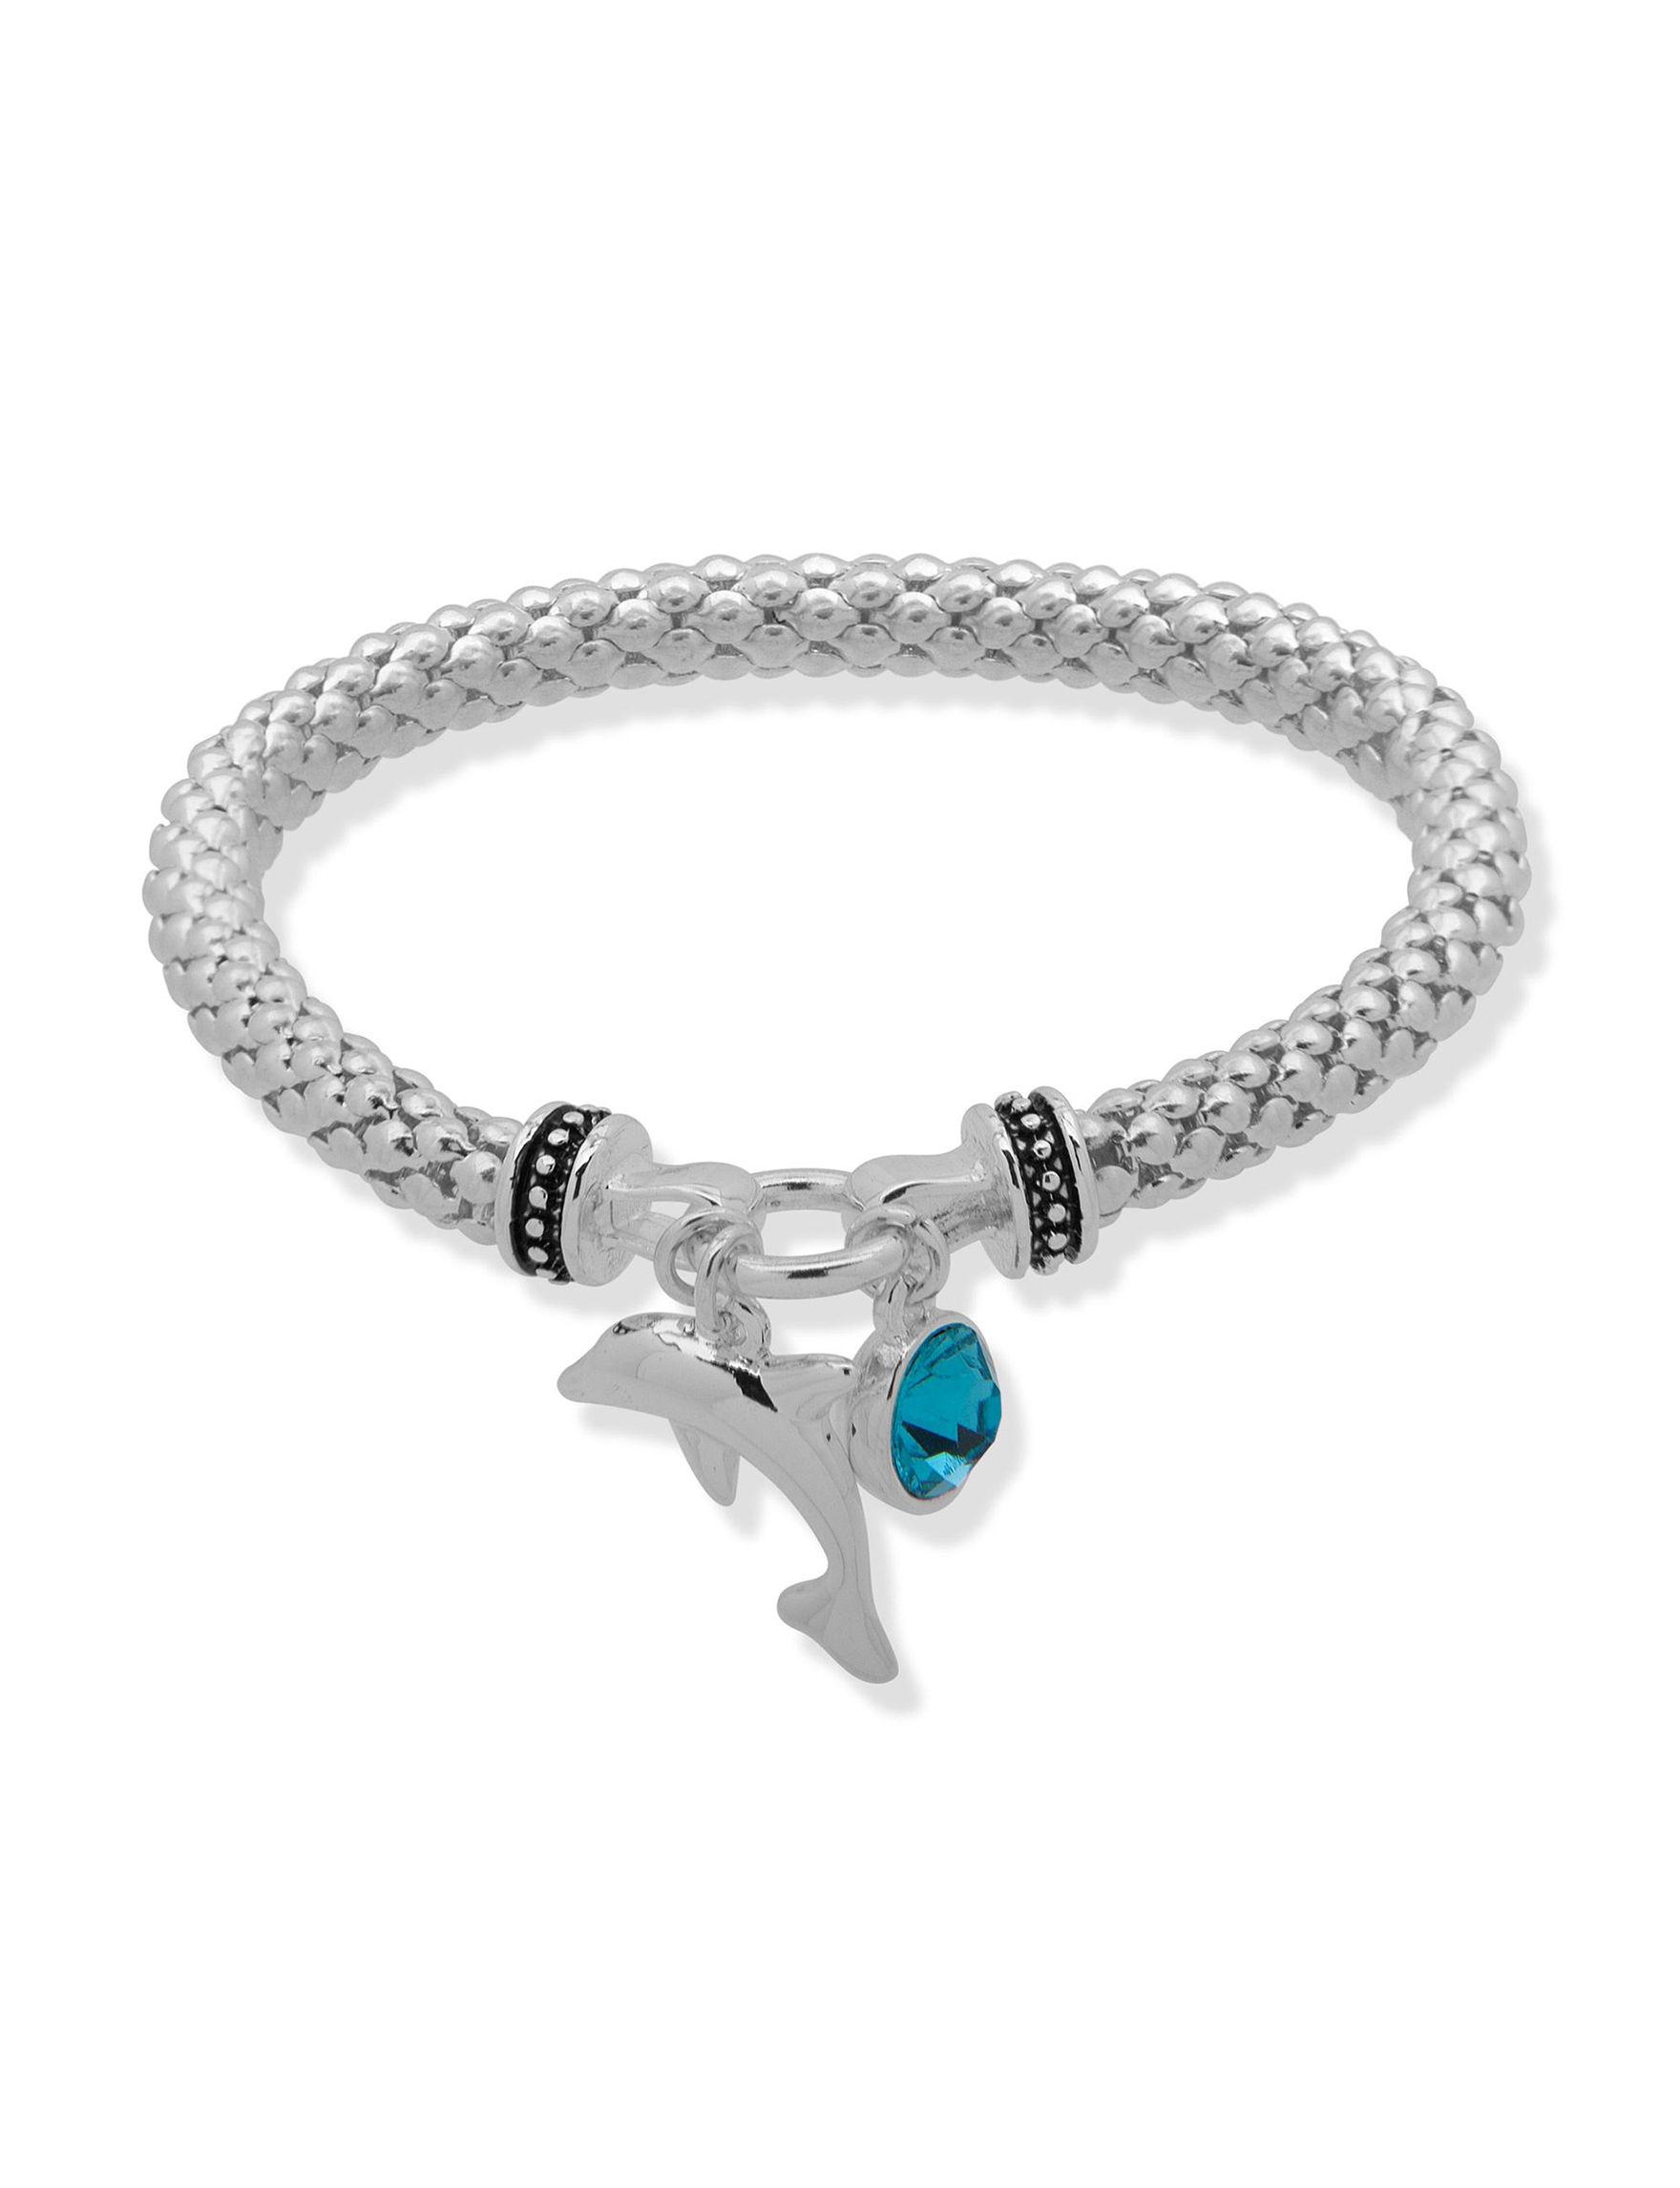 Nine West Turquoise / Silver Bracelets Fashion Jewelry